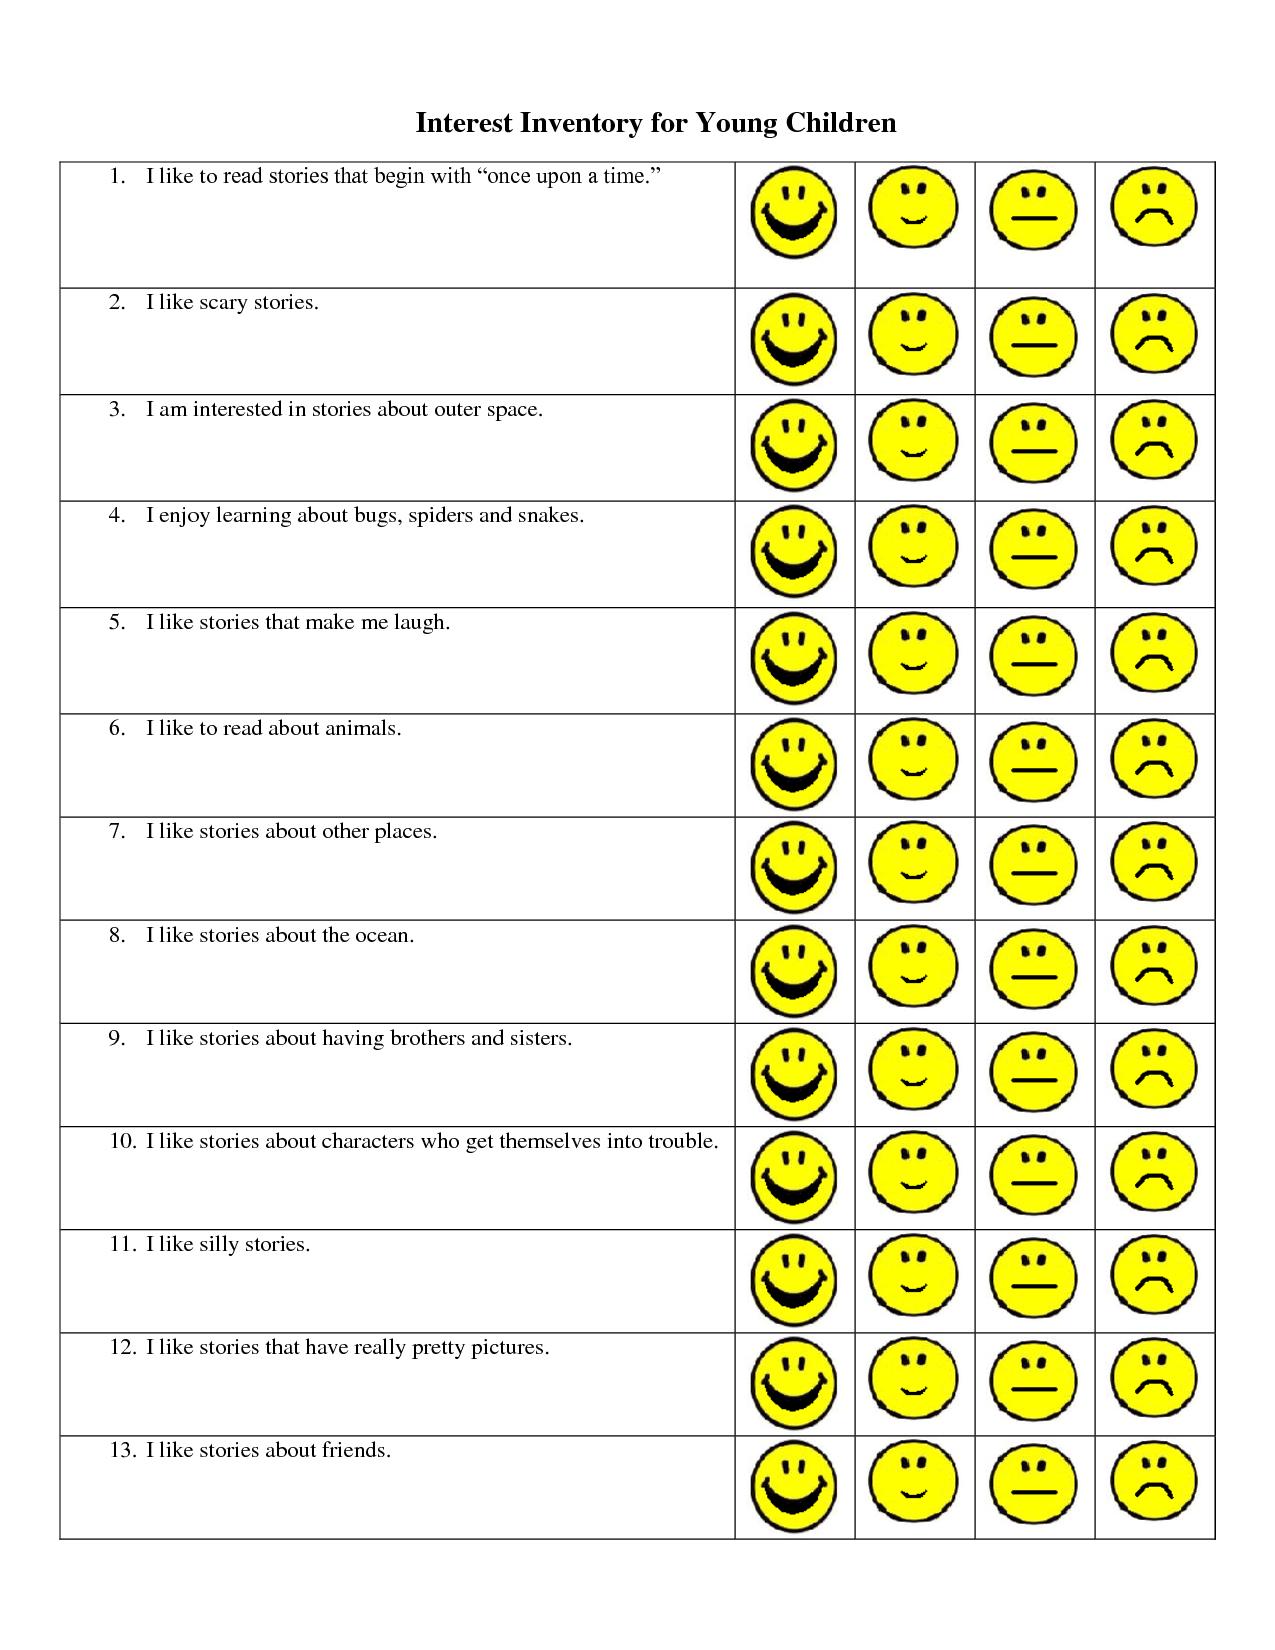 88 Free Download Math Assessment For Kindergarten At End